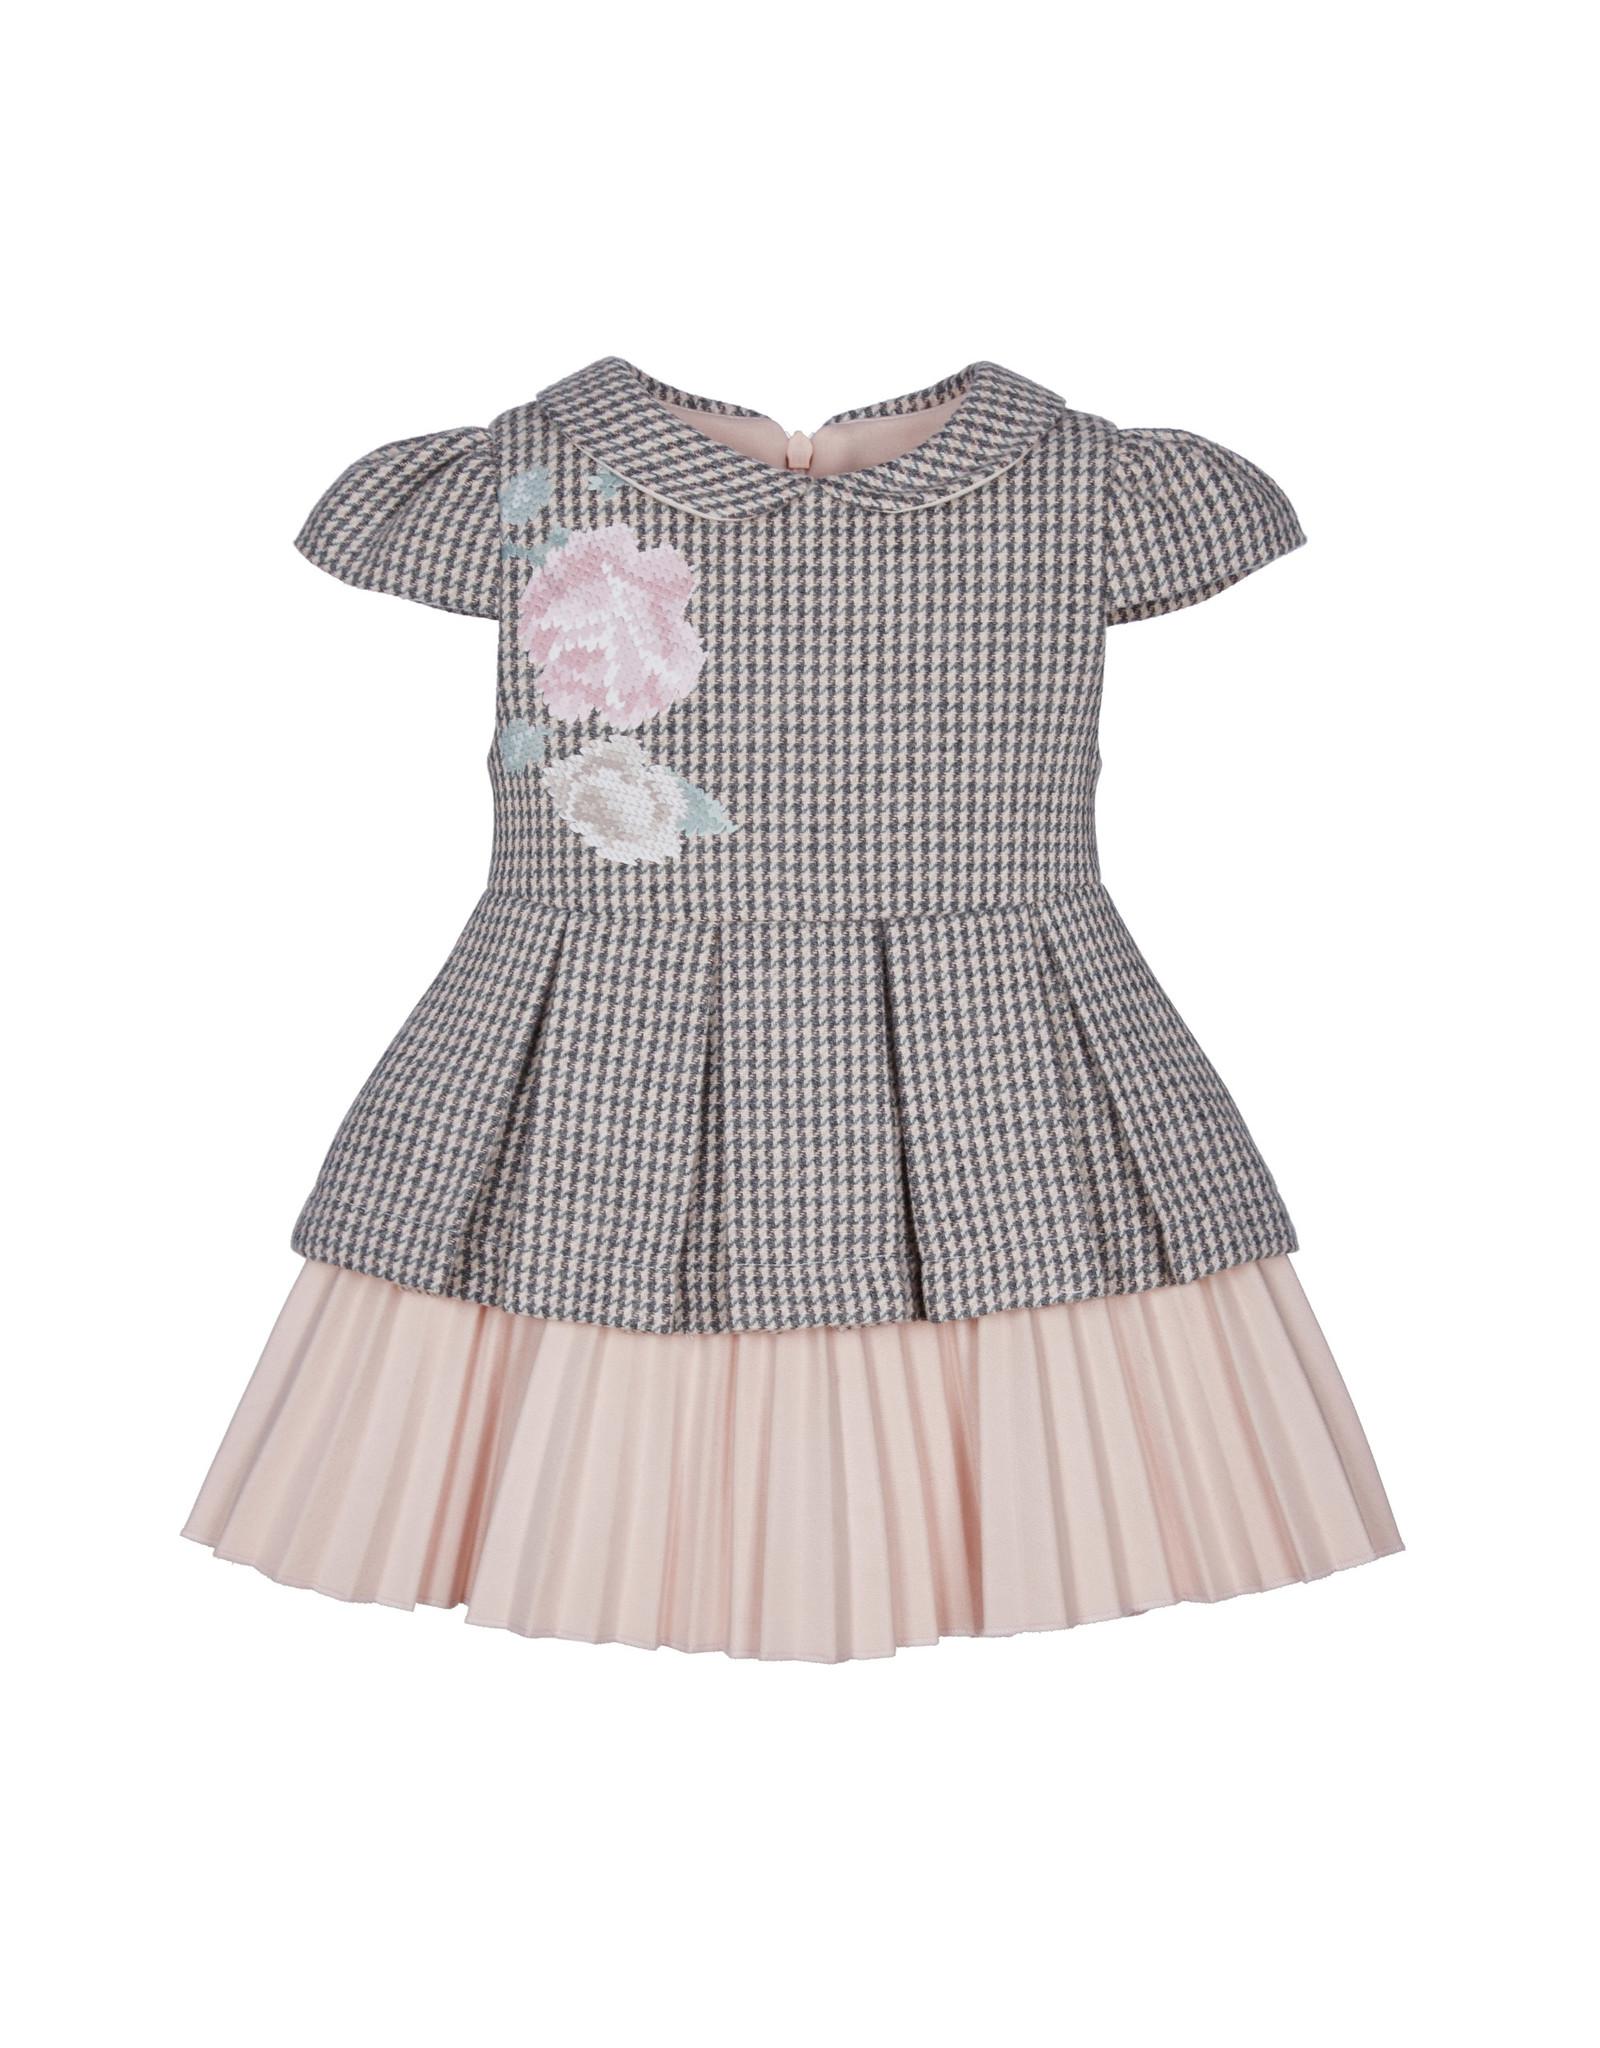 Lapin House Lapin House kleedje pied de poul grijs roze